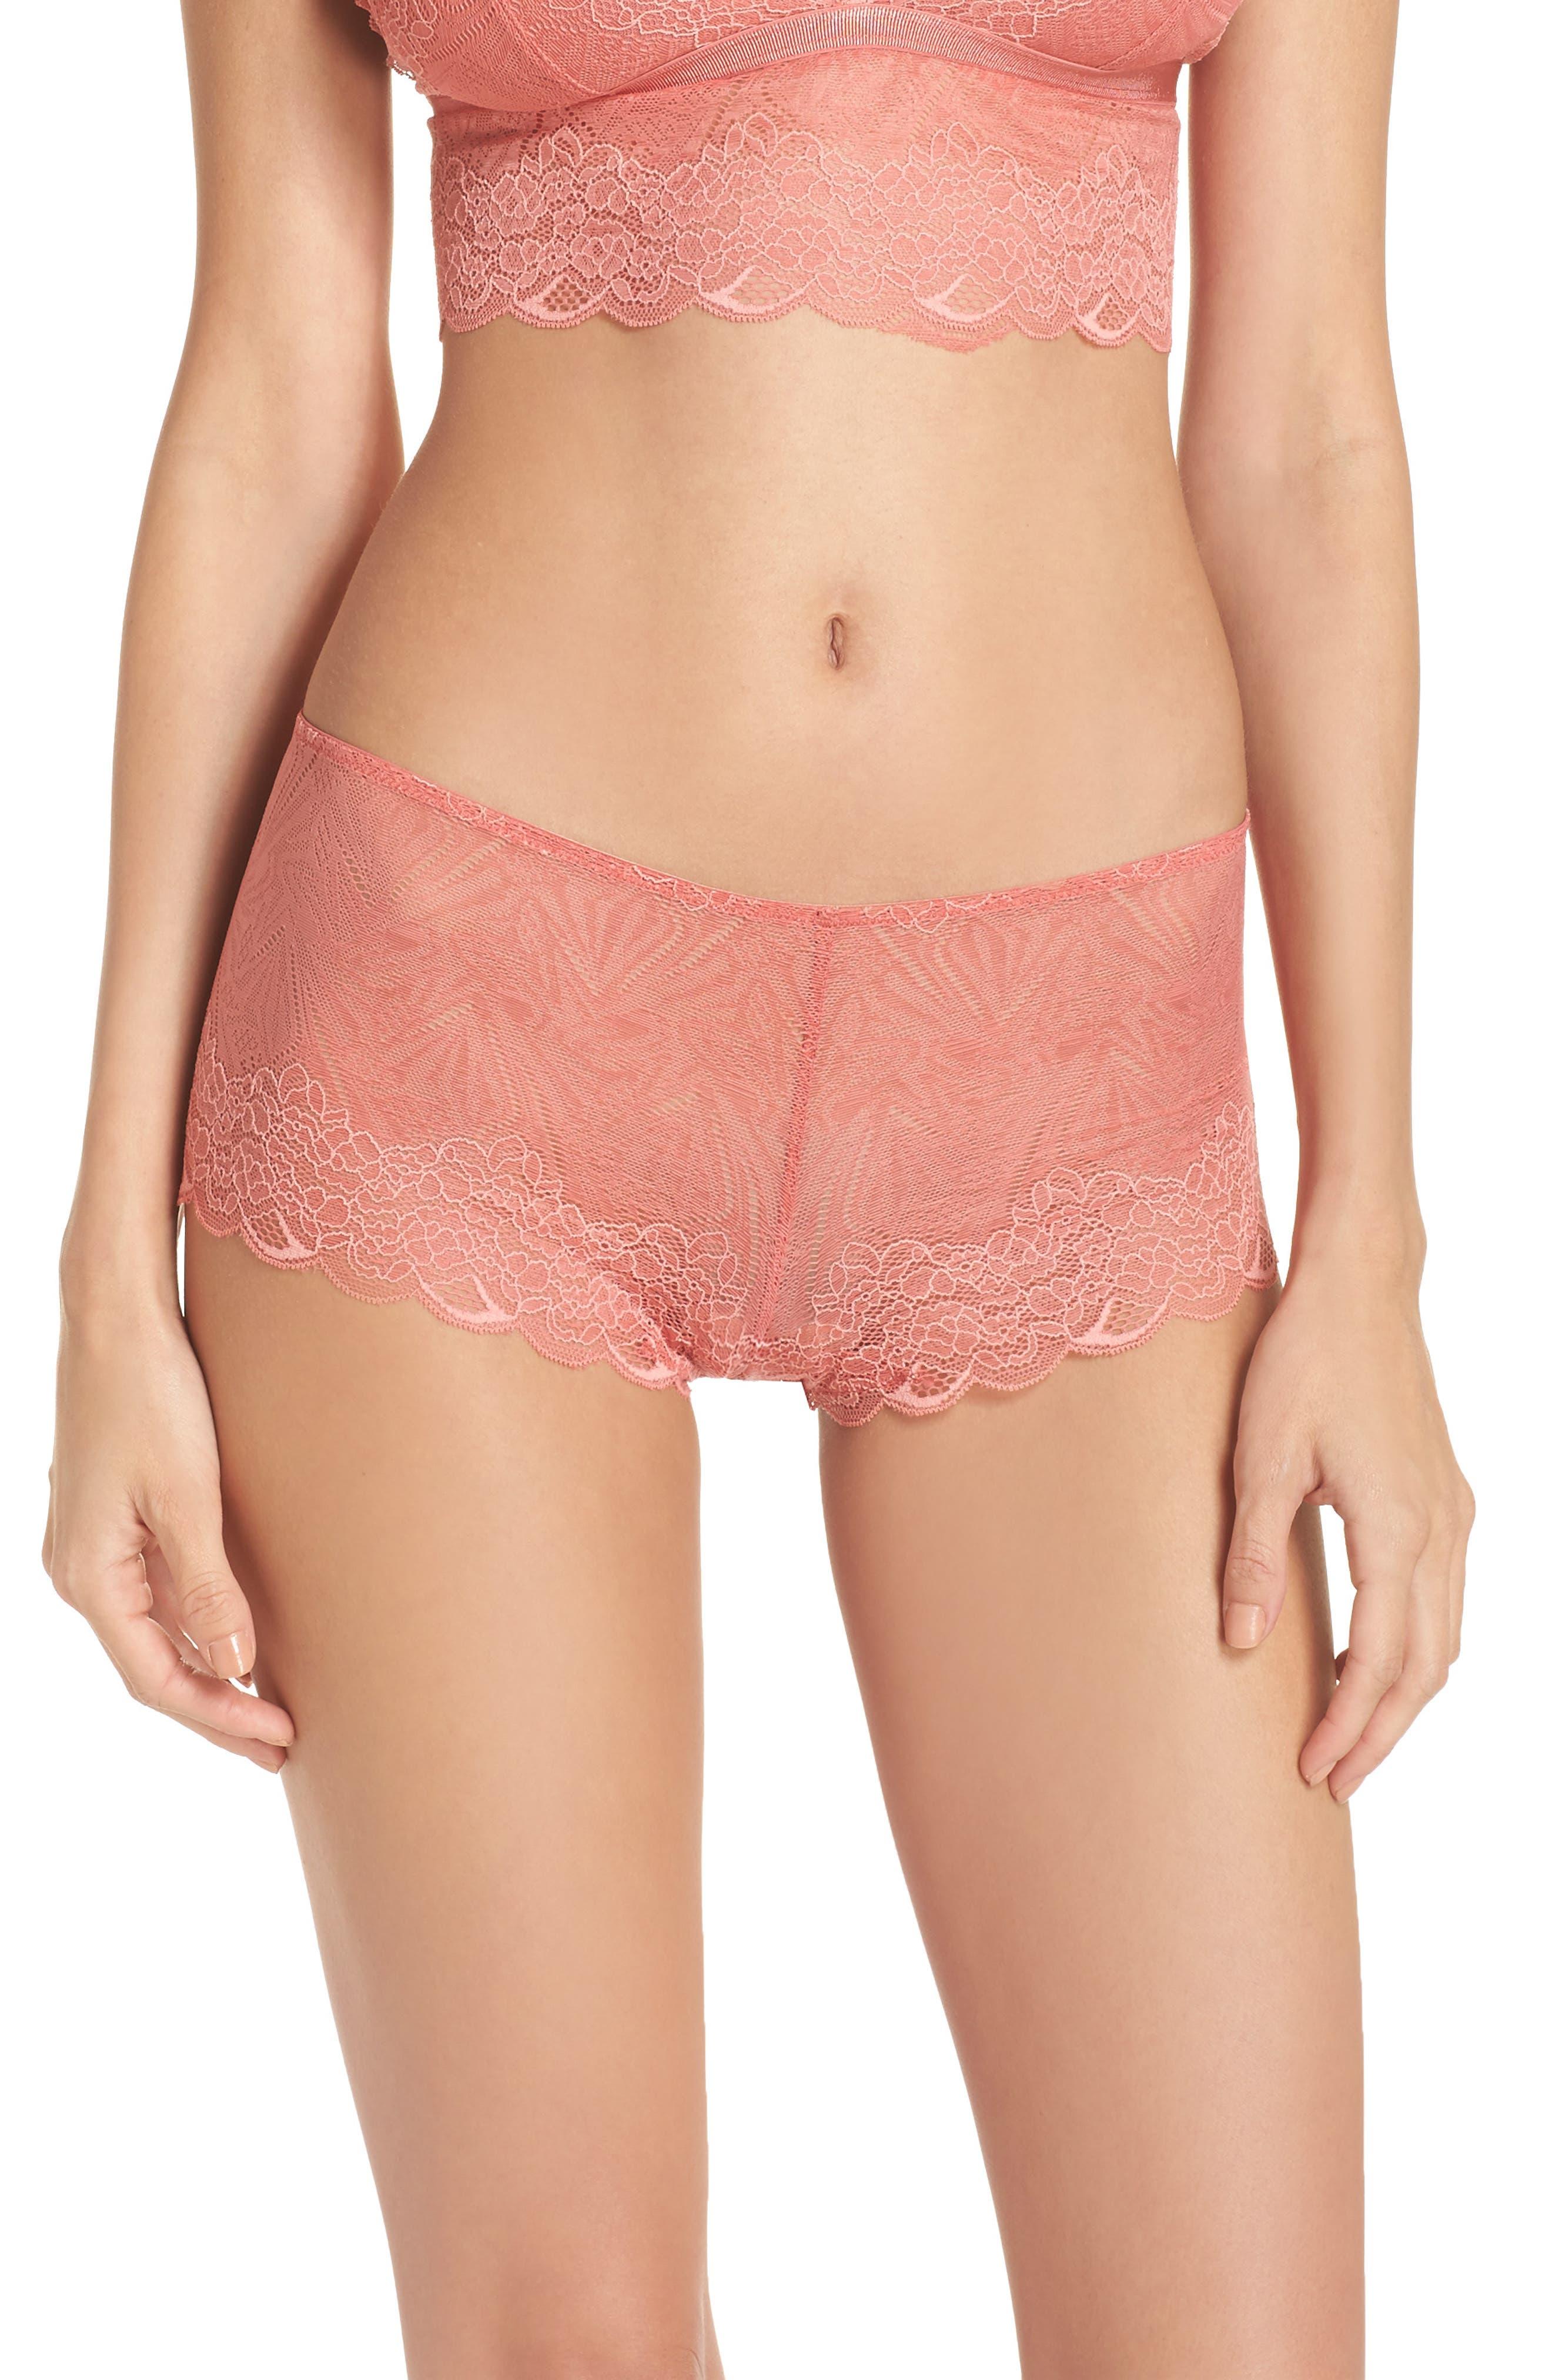 Madewell Lace Boyshorts (3 for $33)